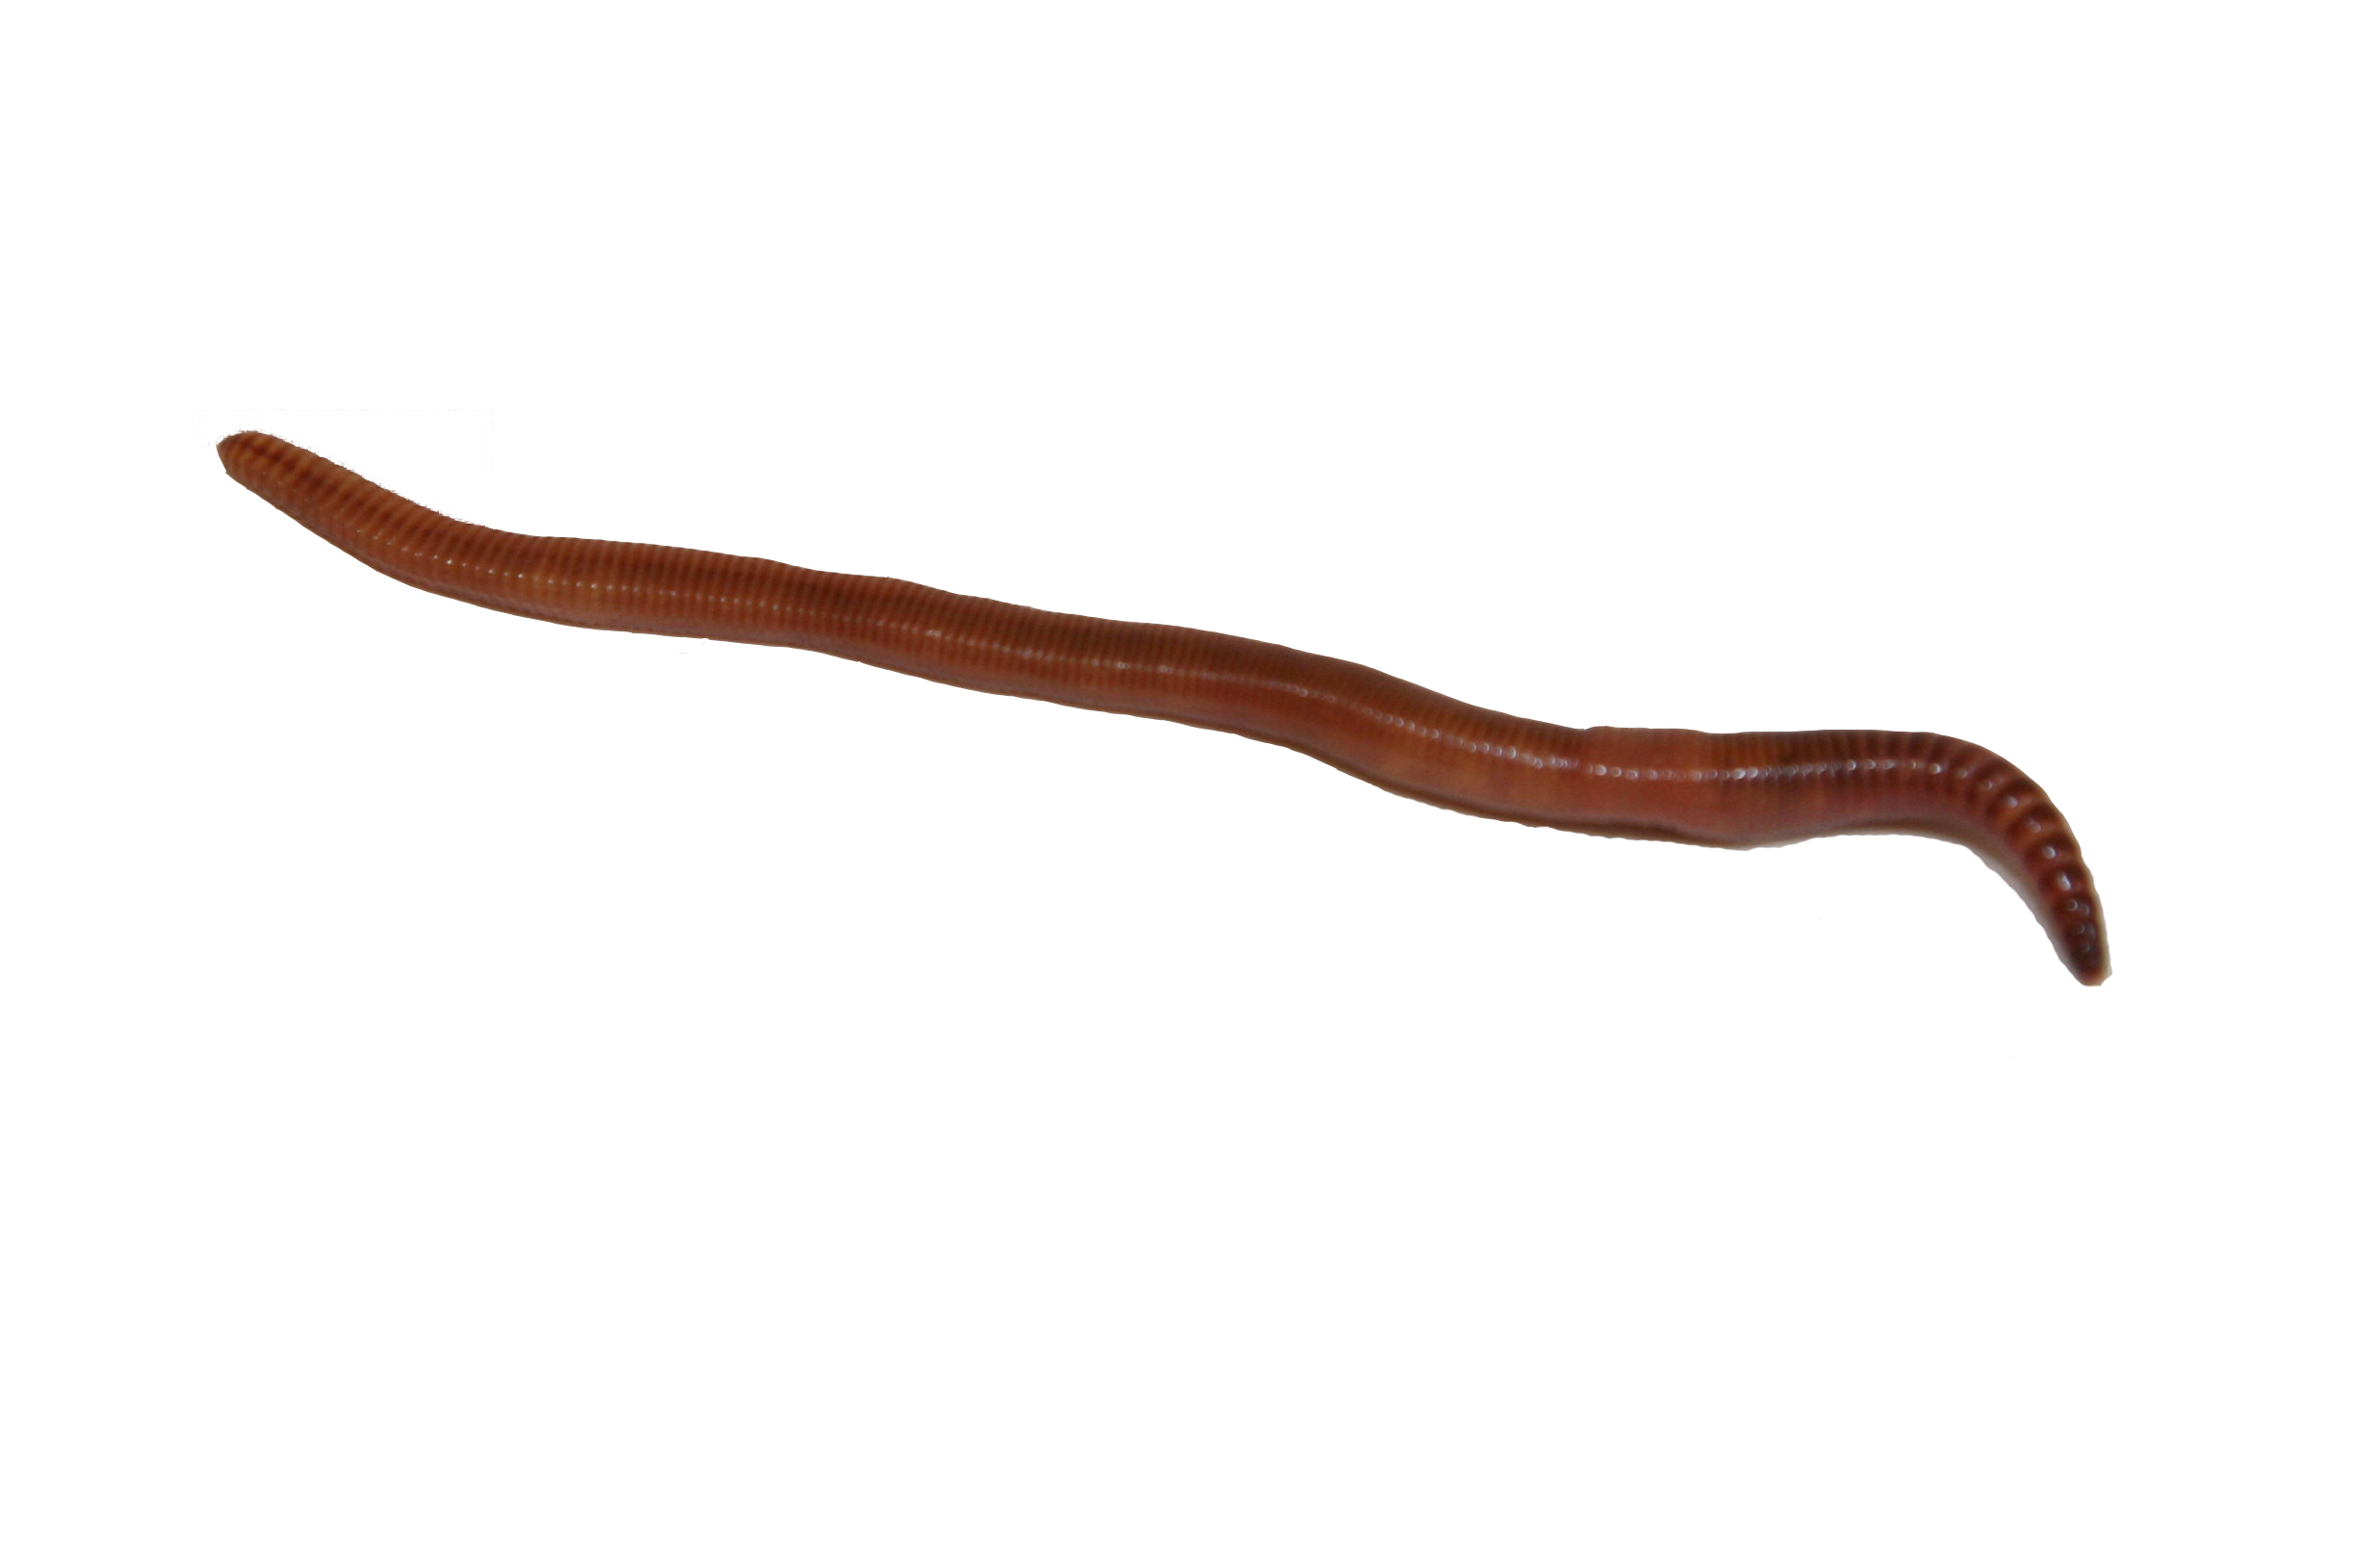 X free clip art. Worm clipart annelida